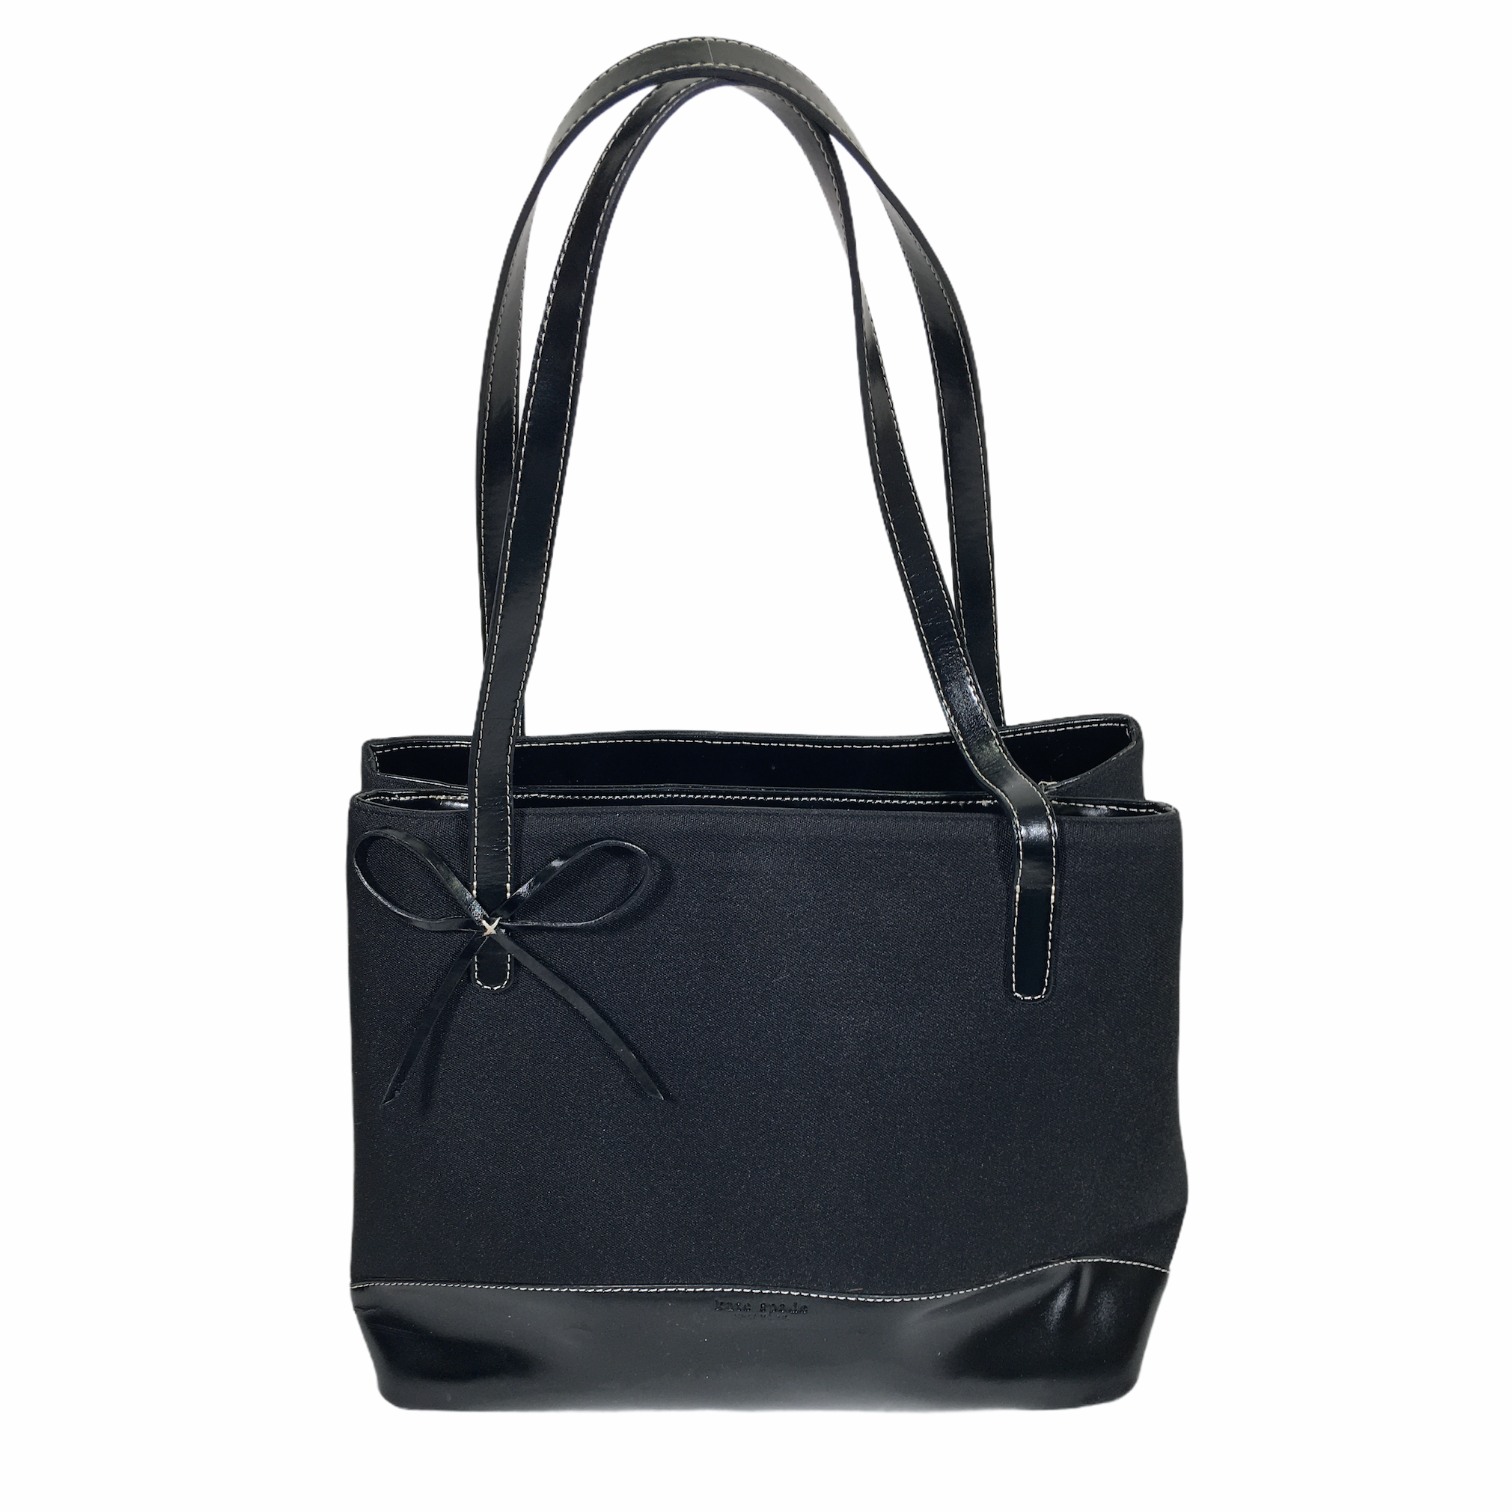 Kate Spade Leather Detail, Black, Size: Designer B